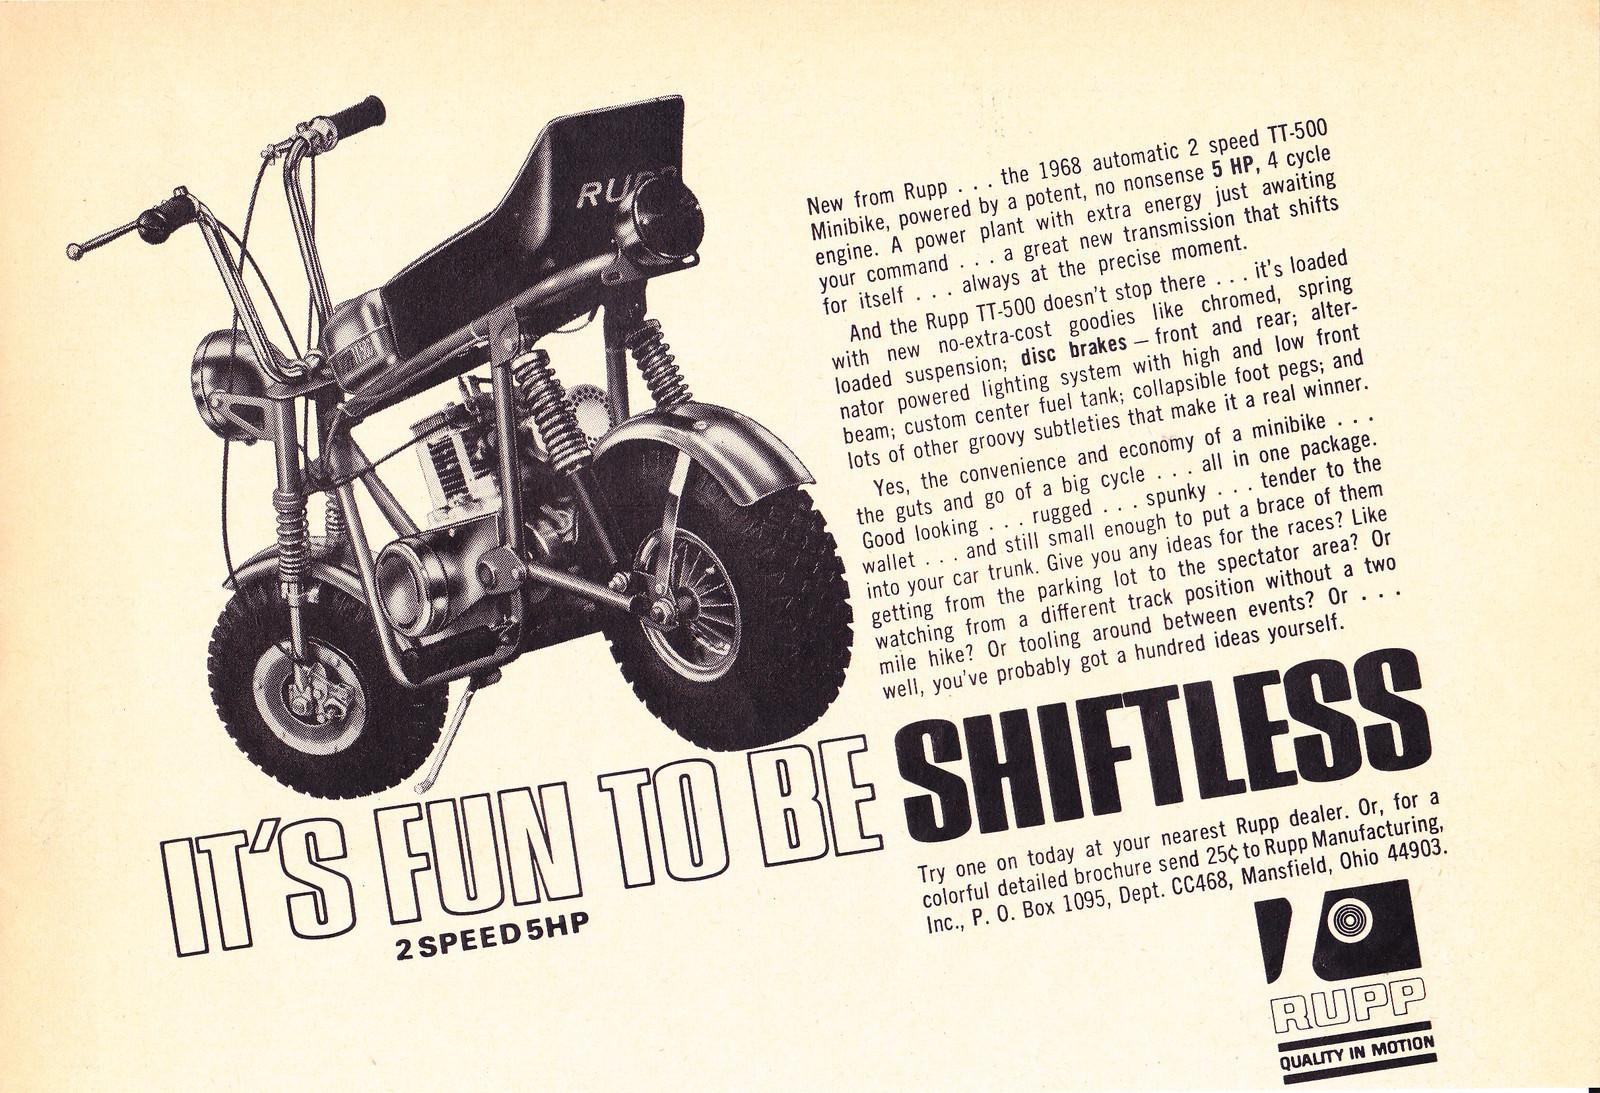 Vintage sprint rupp mini bike history